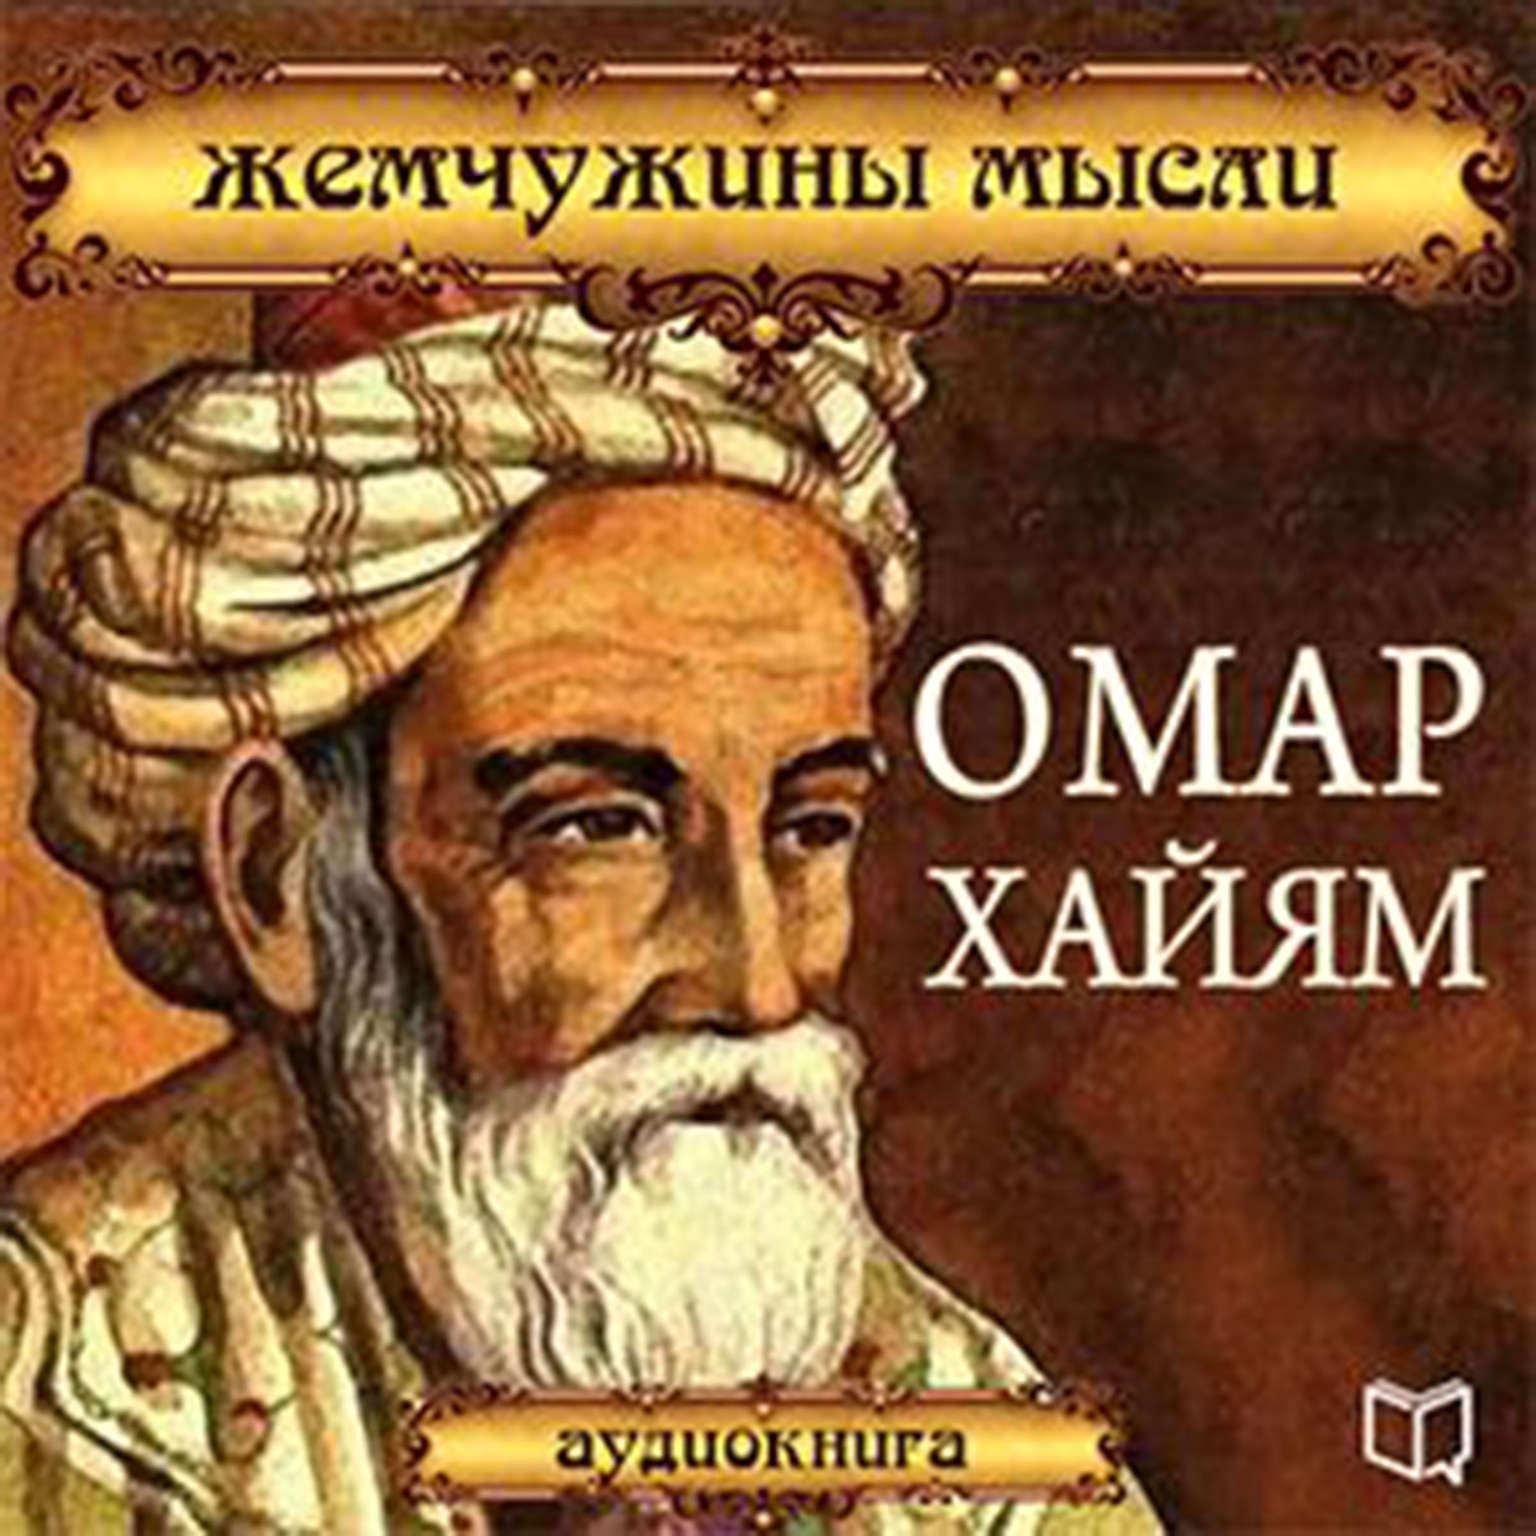 Omar Khayyam: Pearl Thought [Russian Edition] Audiobook, by Omar Khayyám